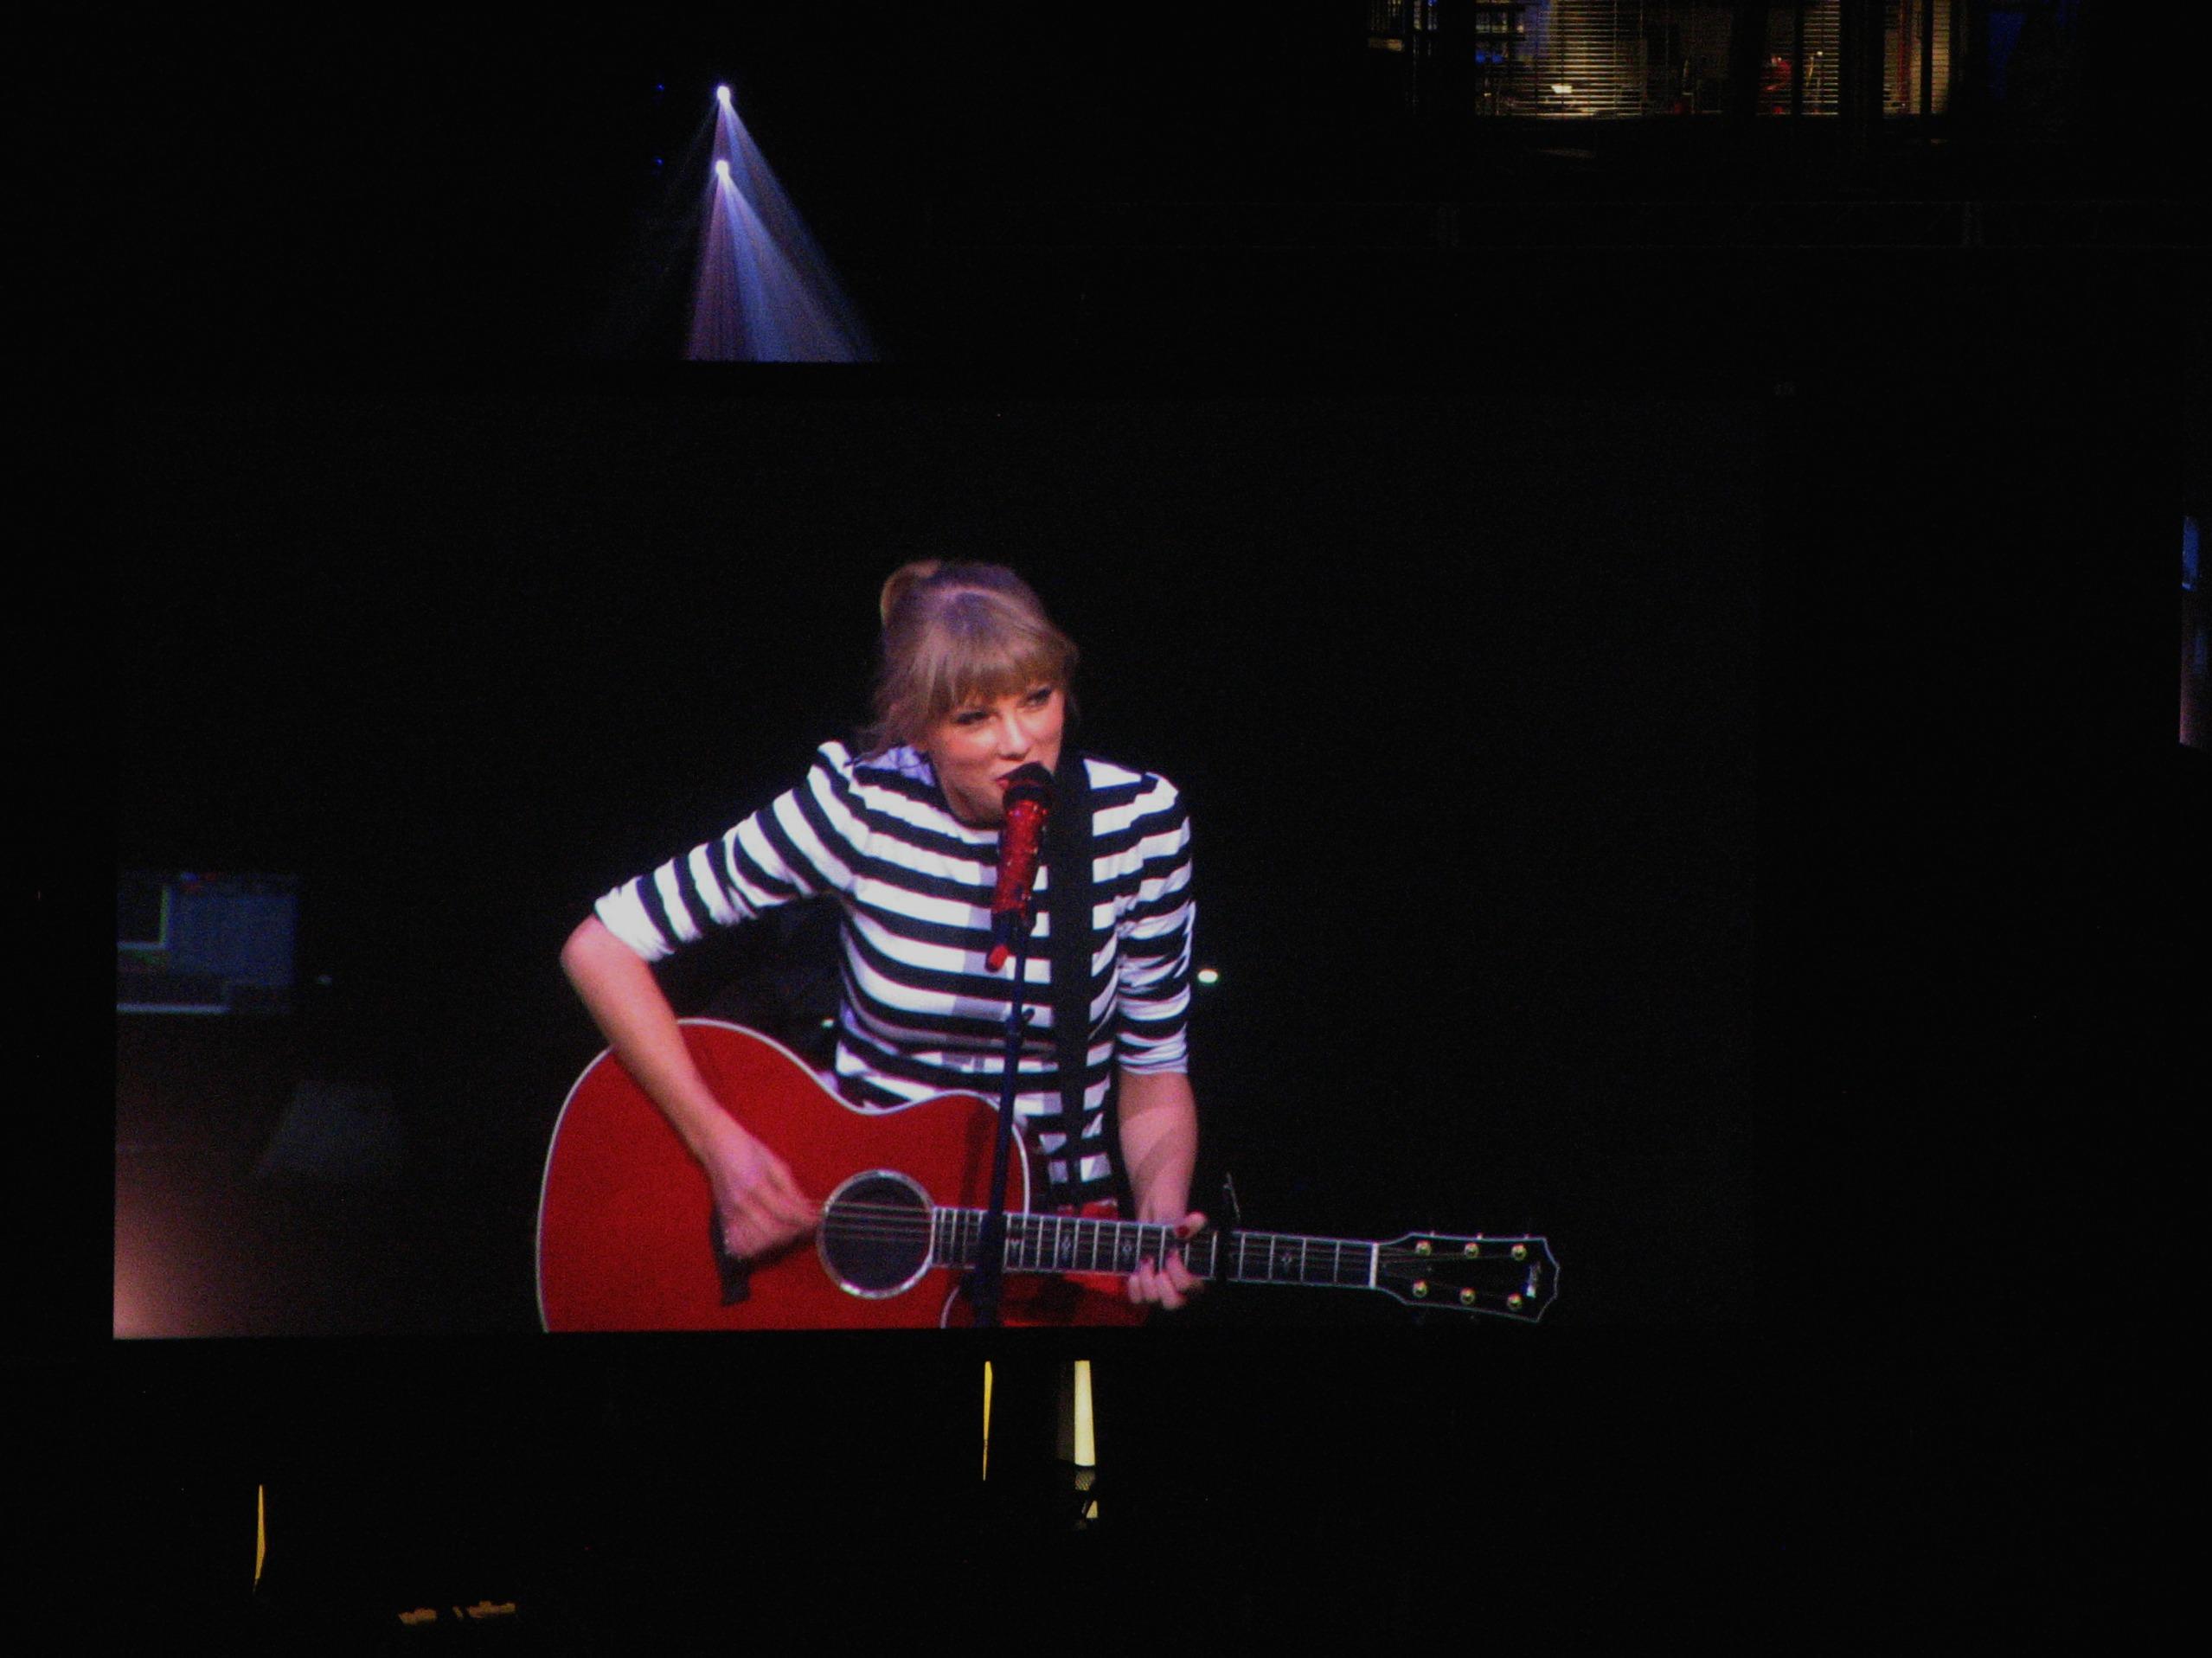 File Taylor Swift IMG 0306 (9926892725).jpg - Wikimedia Commons 8b670cd4ef